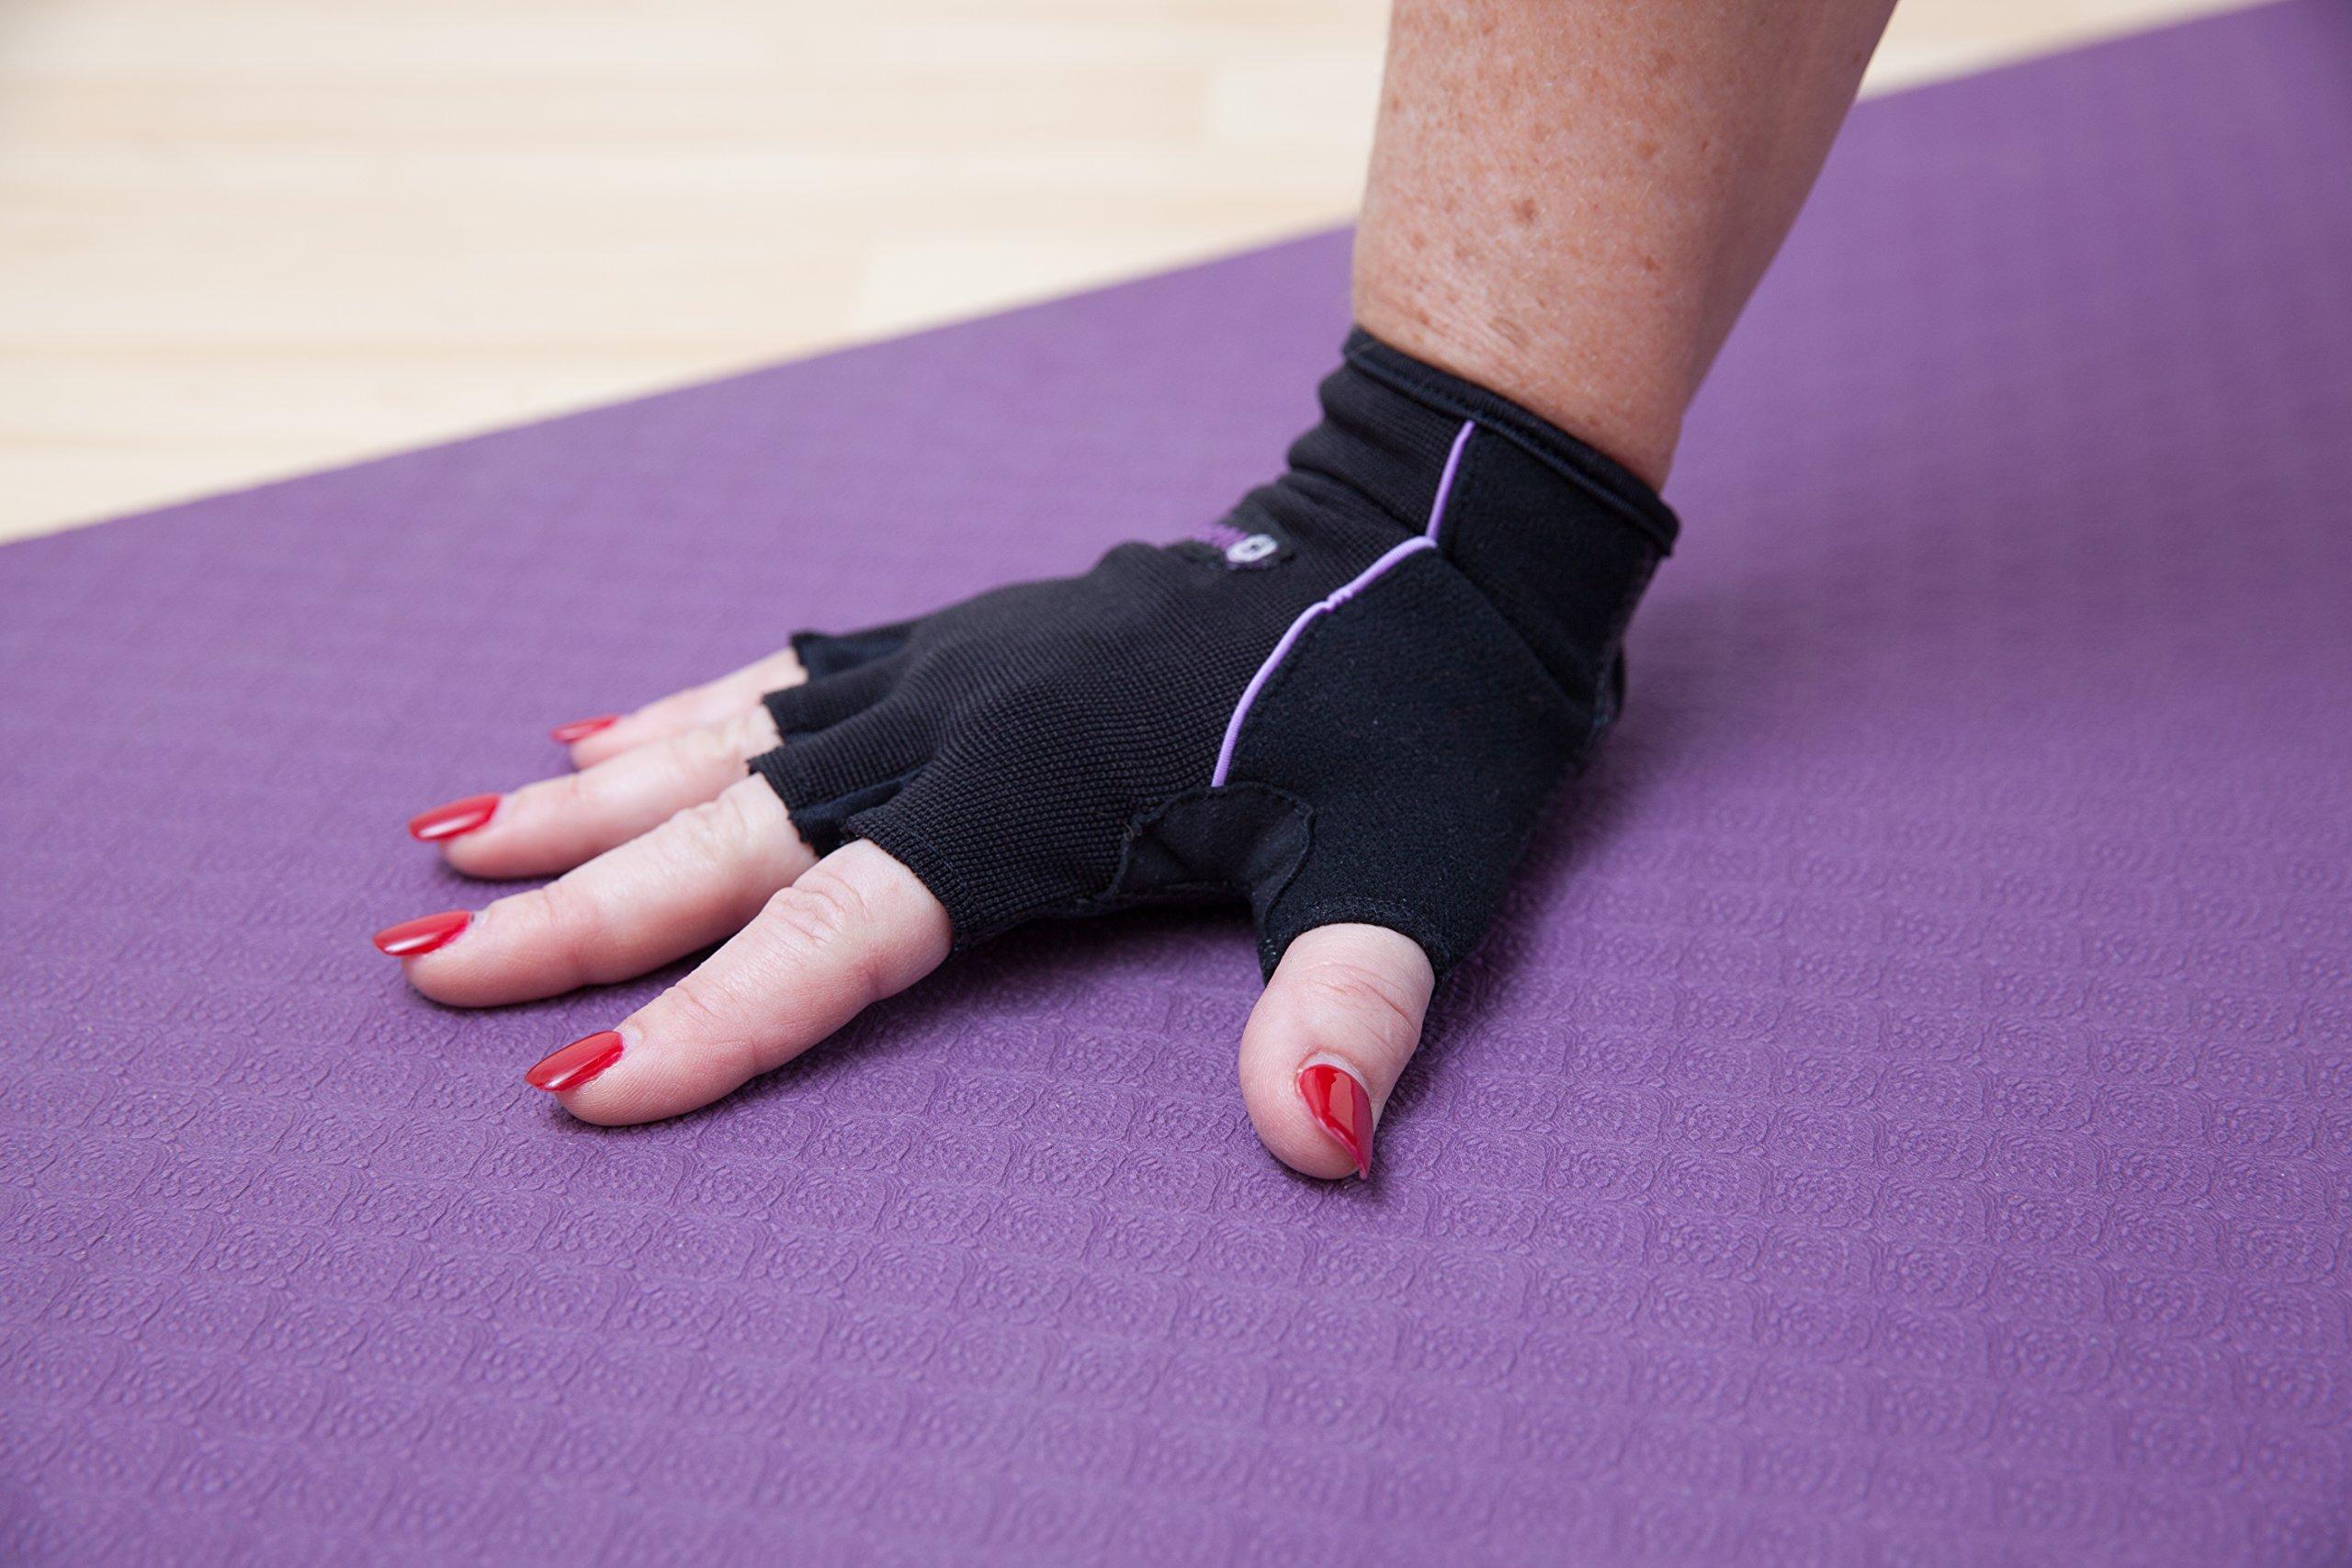 Amazon.com: BraceAbility Yoga Wrist Support Brace